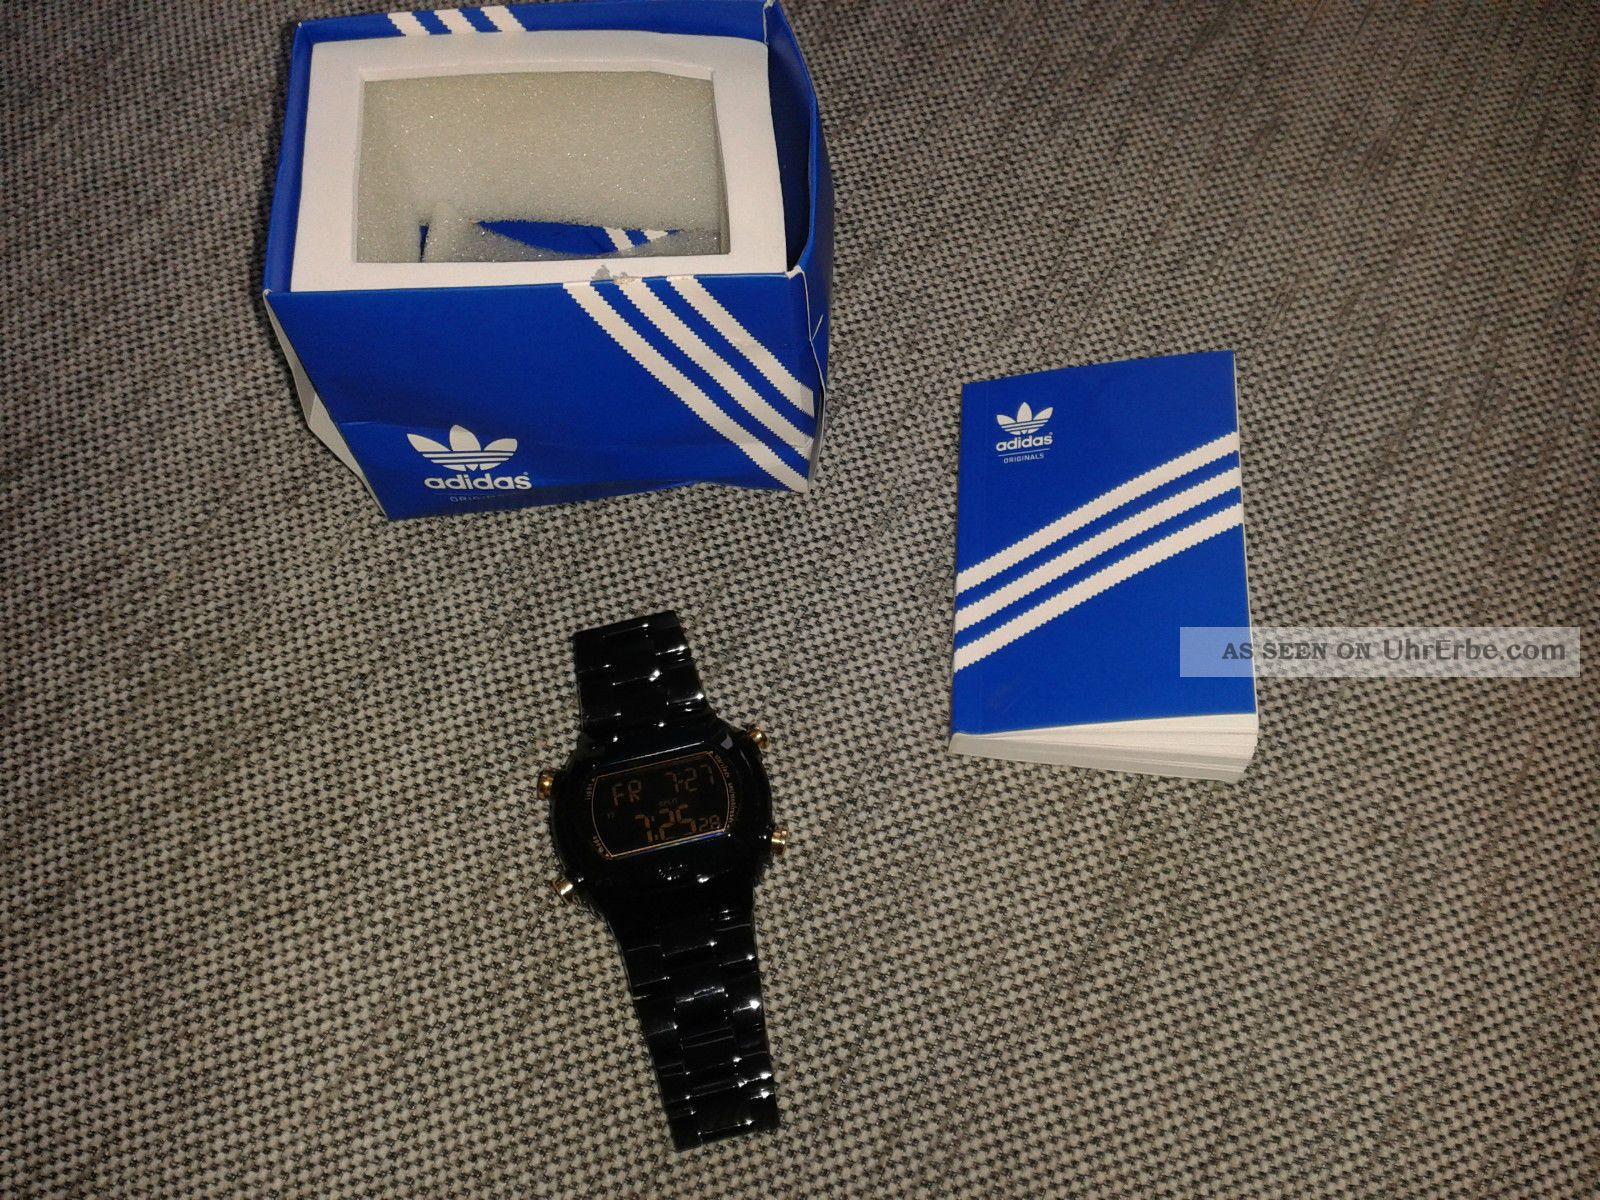 Adidas Unisex - Armbanduhr Digital Plastik Adh6503 Armbanduhren Bild